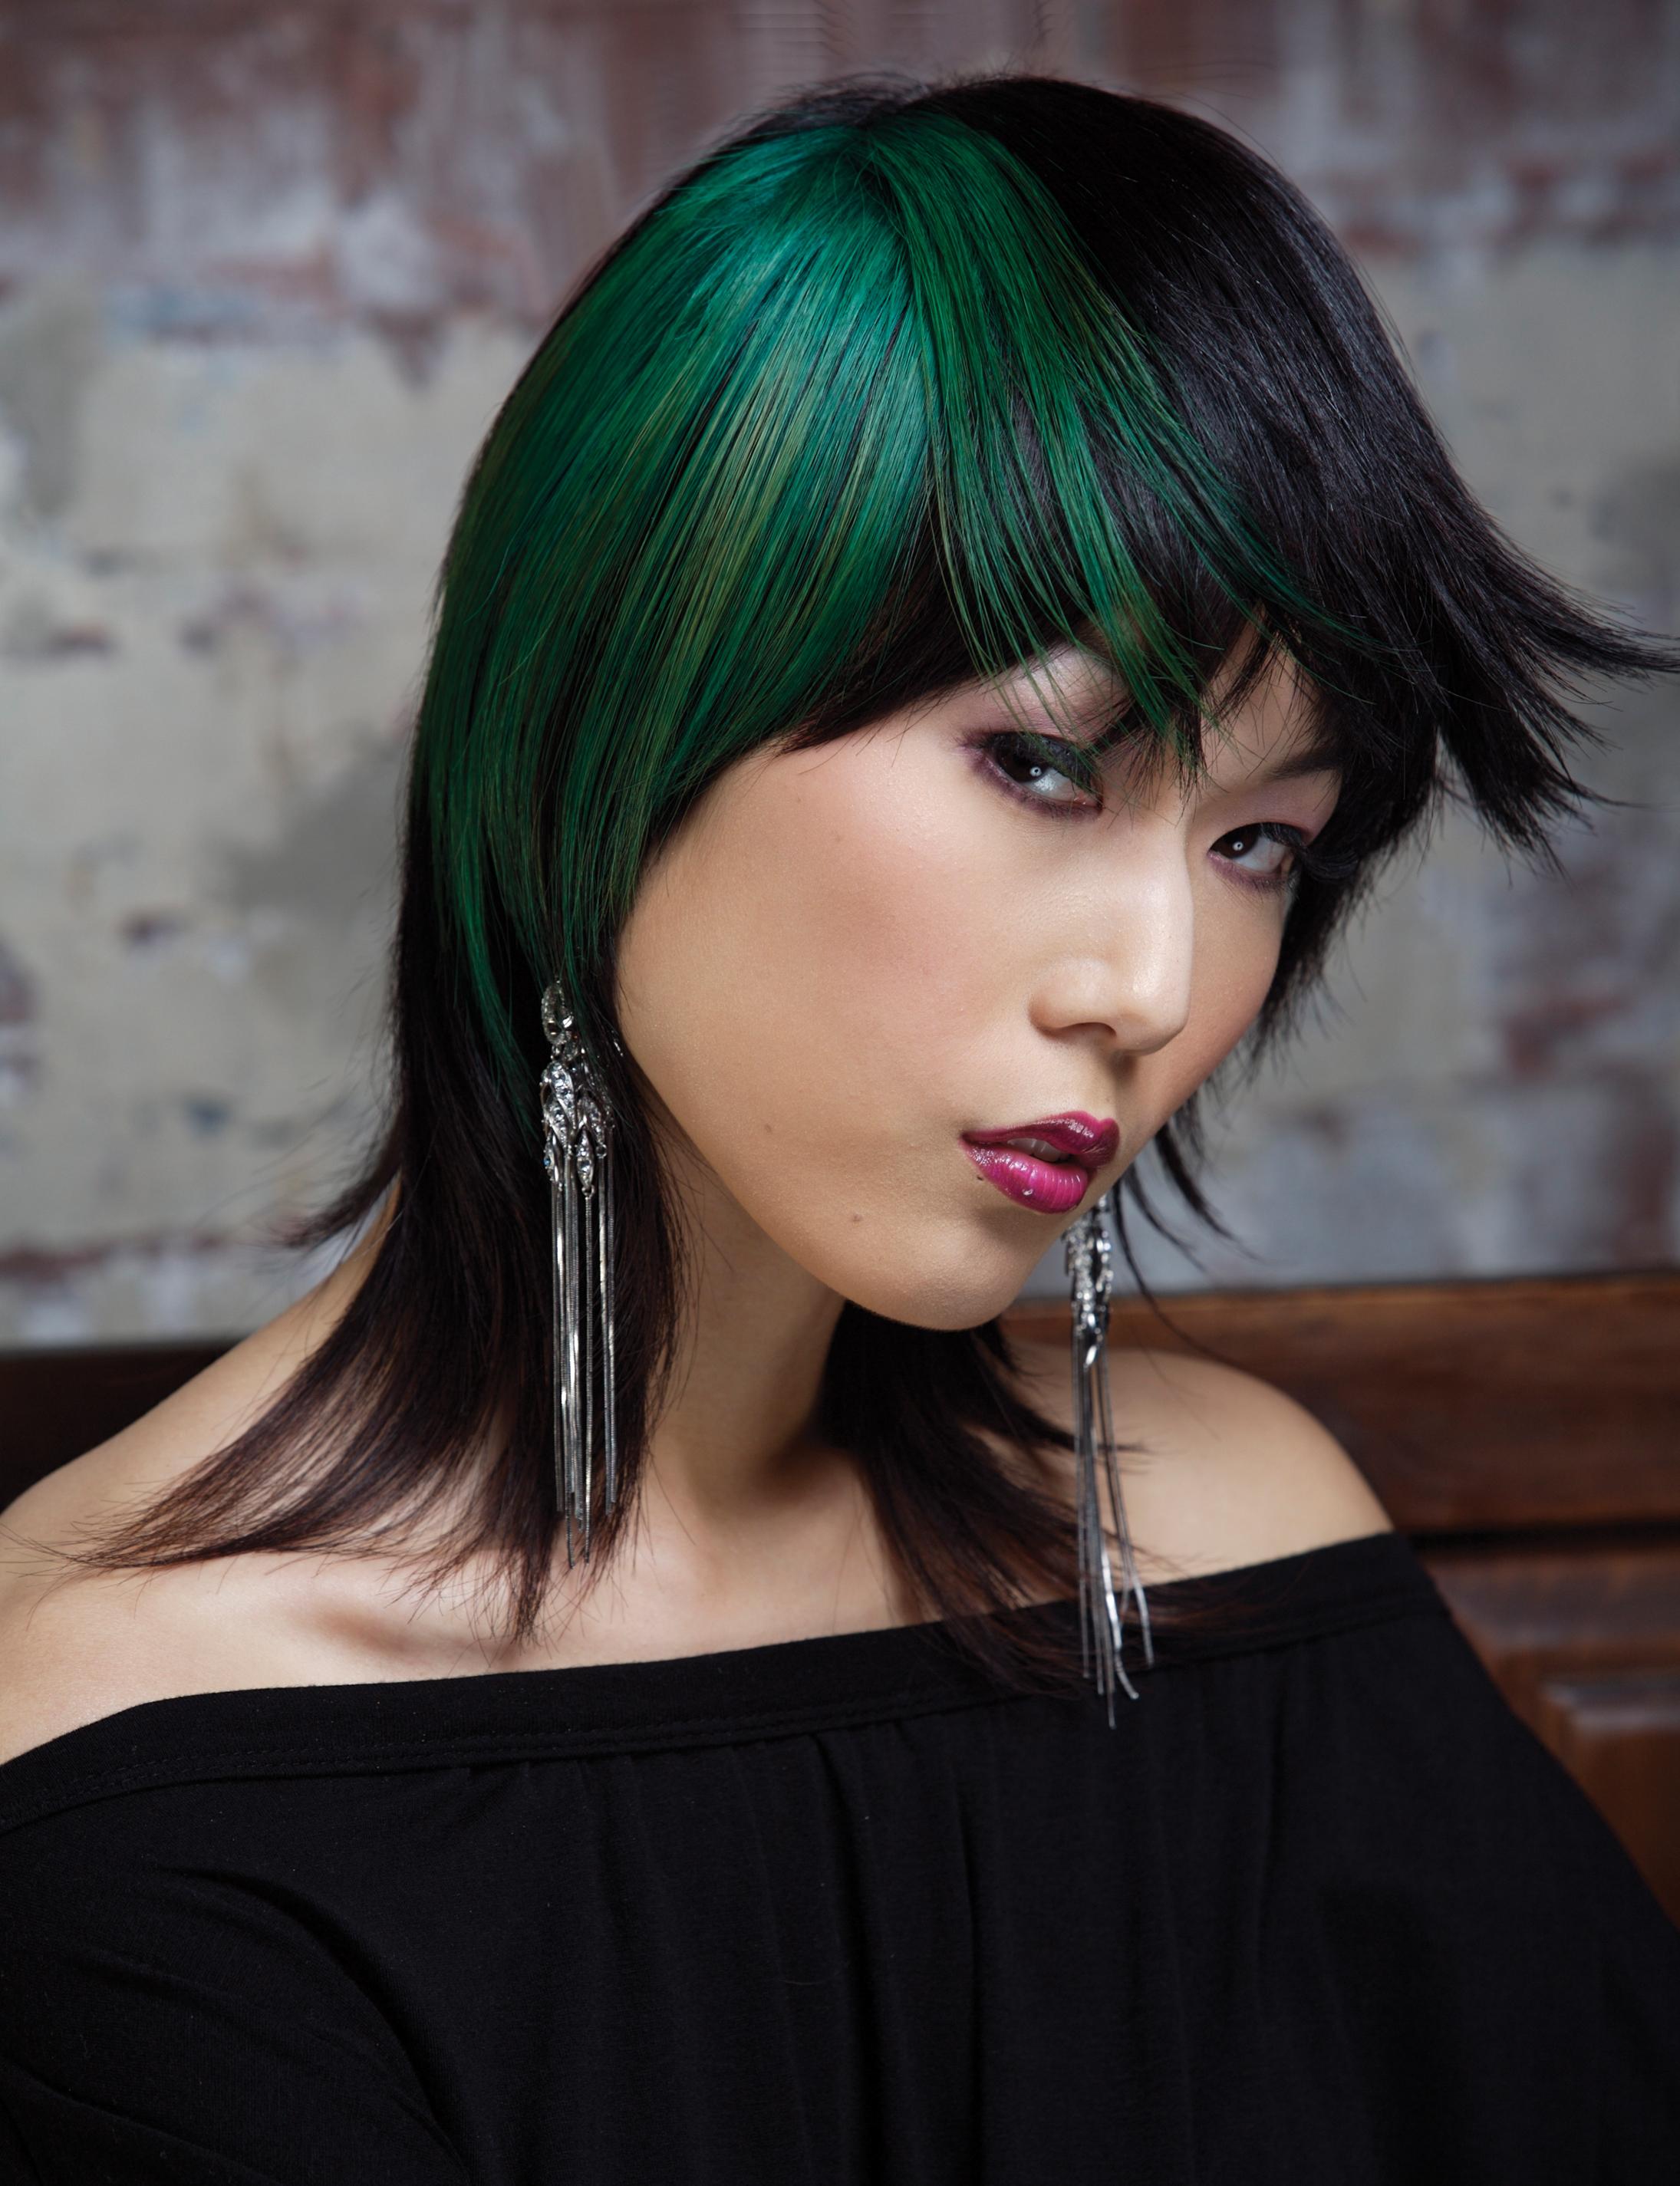 Lawrence picture - green hair - edit fly aways v2.jpg